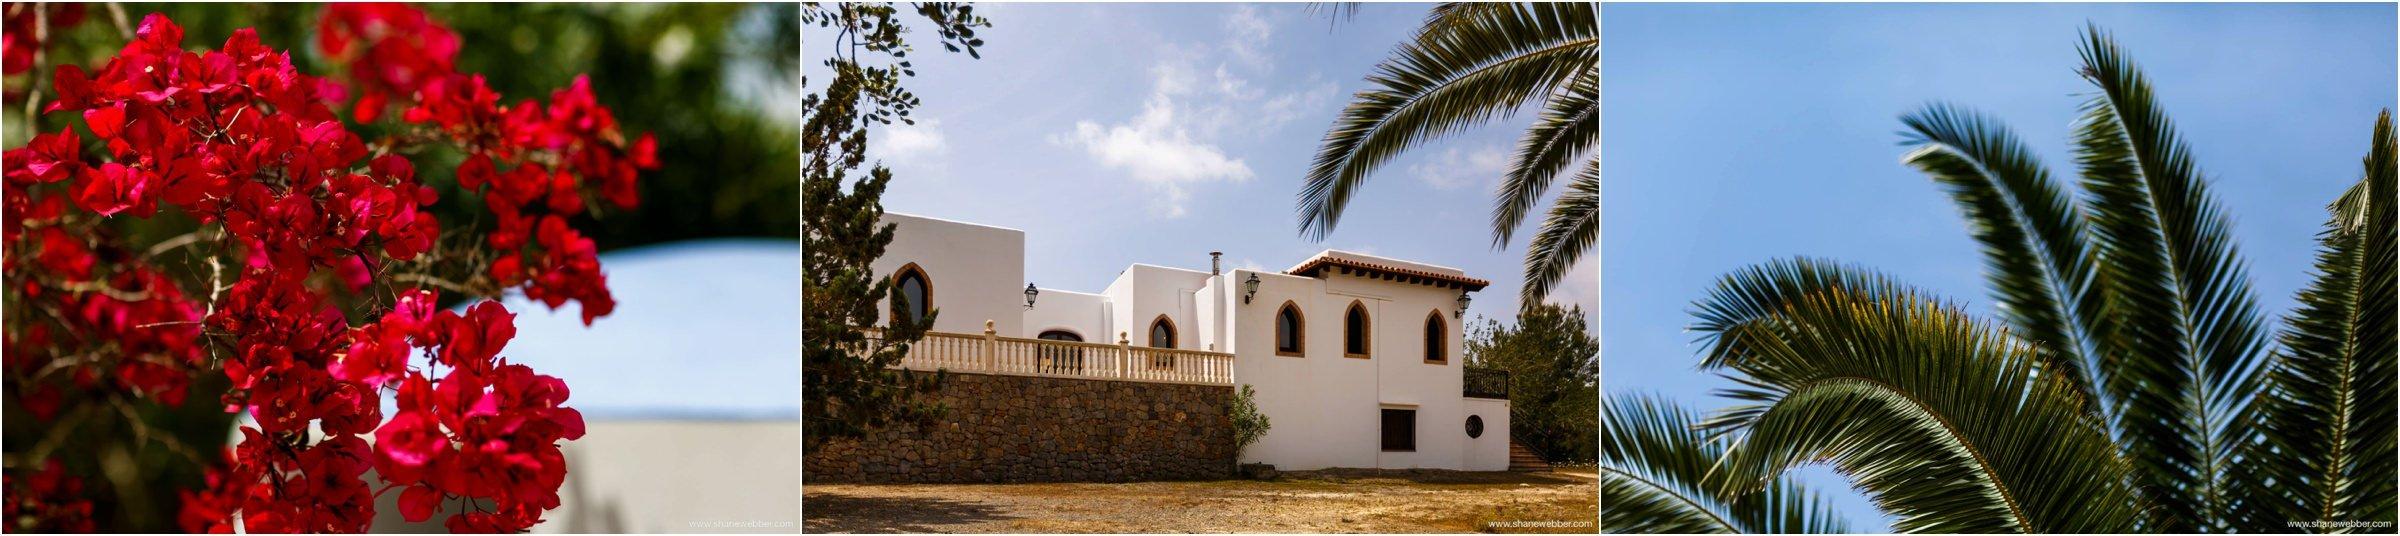 Casa Juan Vich Santa Eulalia Ibiza